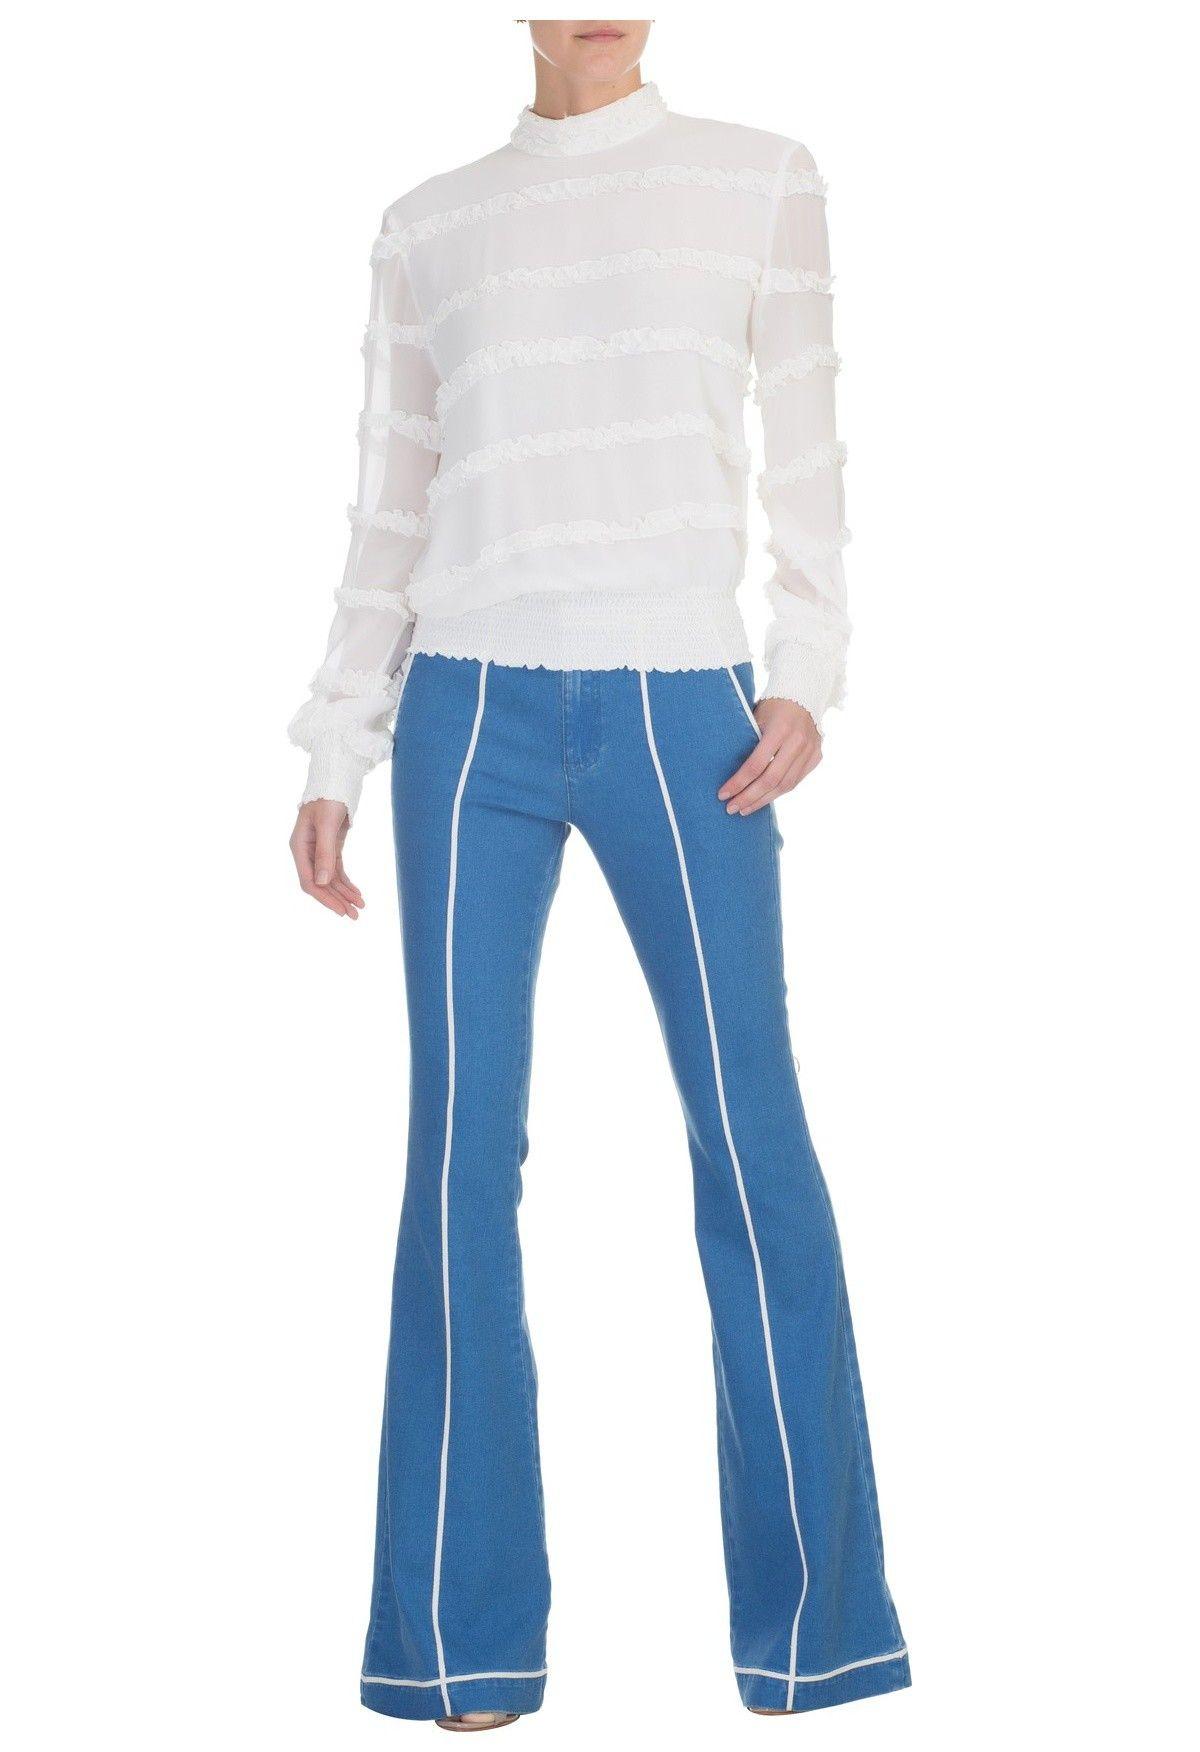 MIXED - Calça jeans flare Consuelo - OQVestir